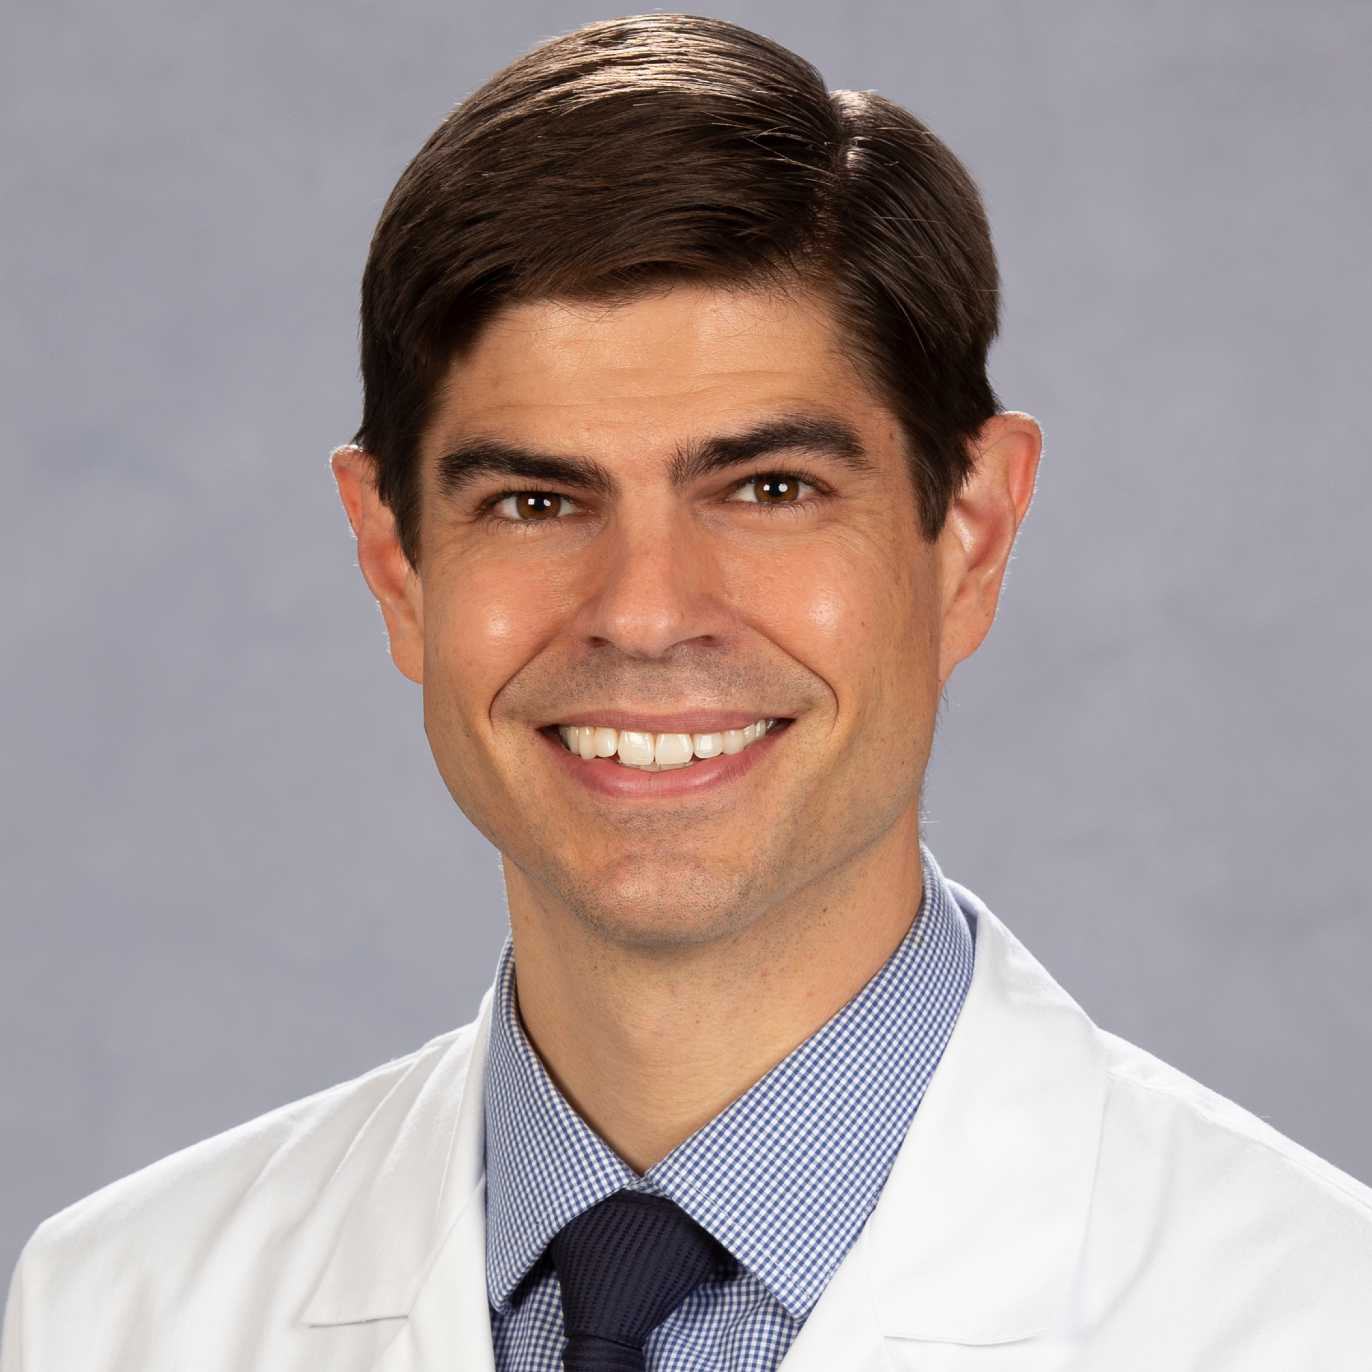 Thomas A. Masterson, MD